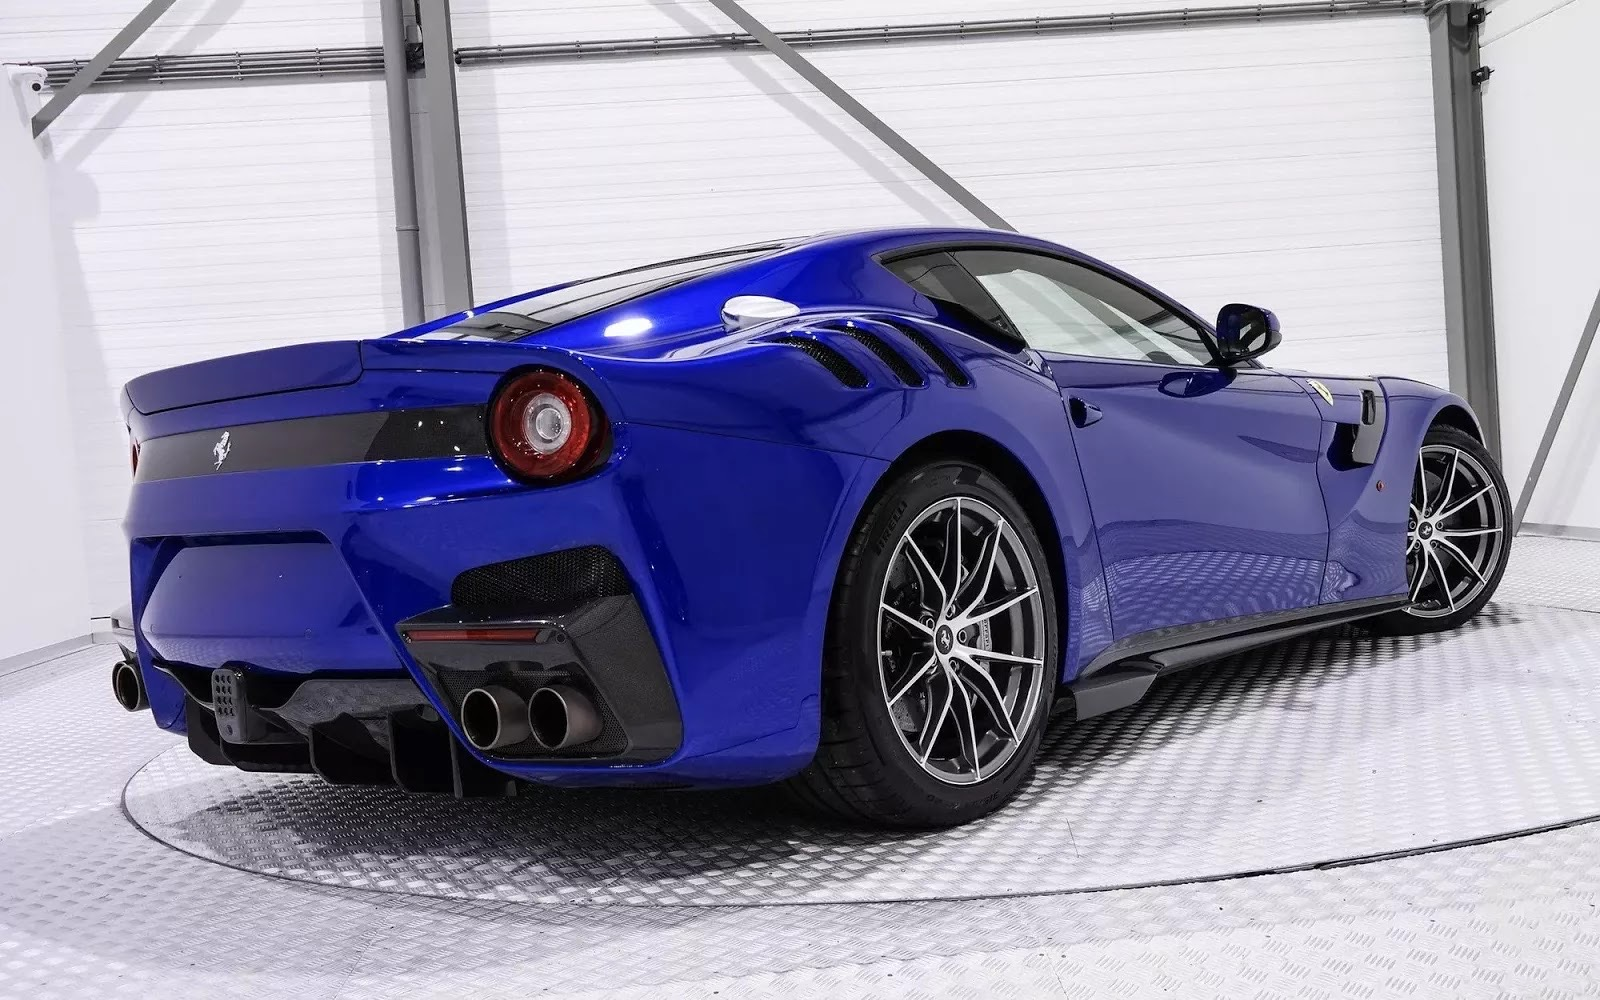 One-Off_Electric_Blue_Ferrari_F12tdf_07